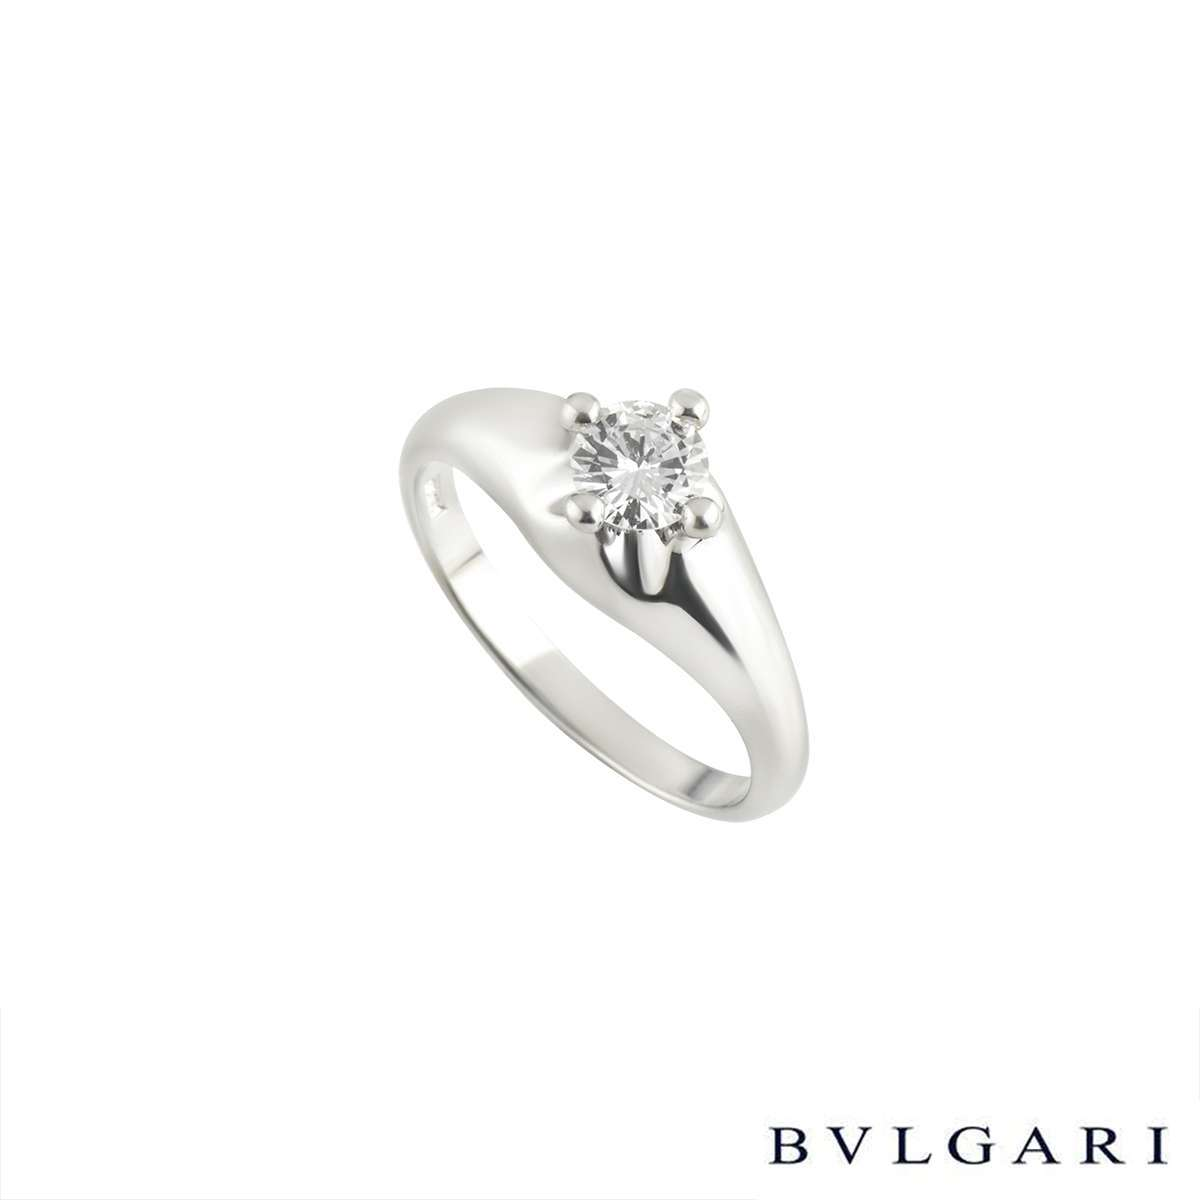 Bvlgari Corona Platinum Diamond Ring 0.30ct F/VS1